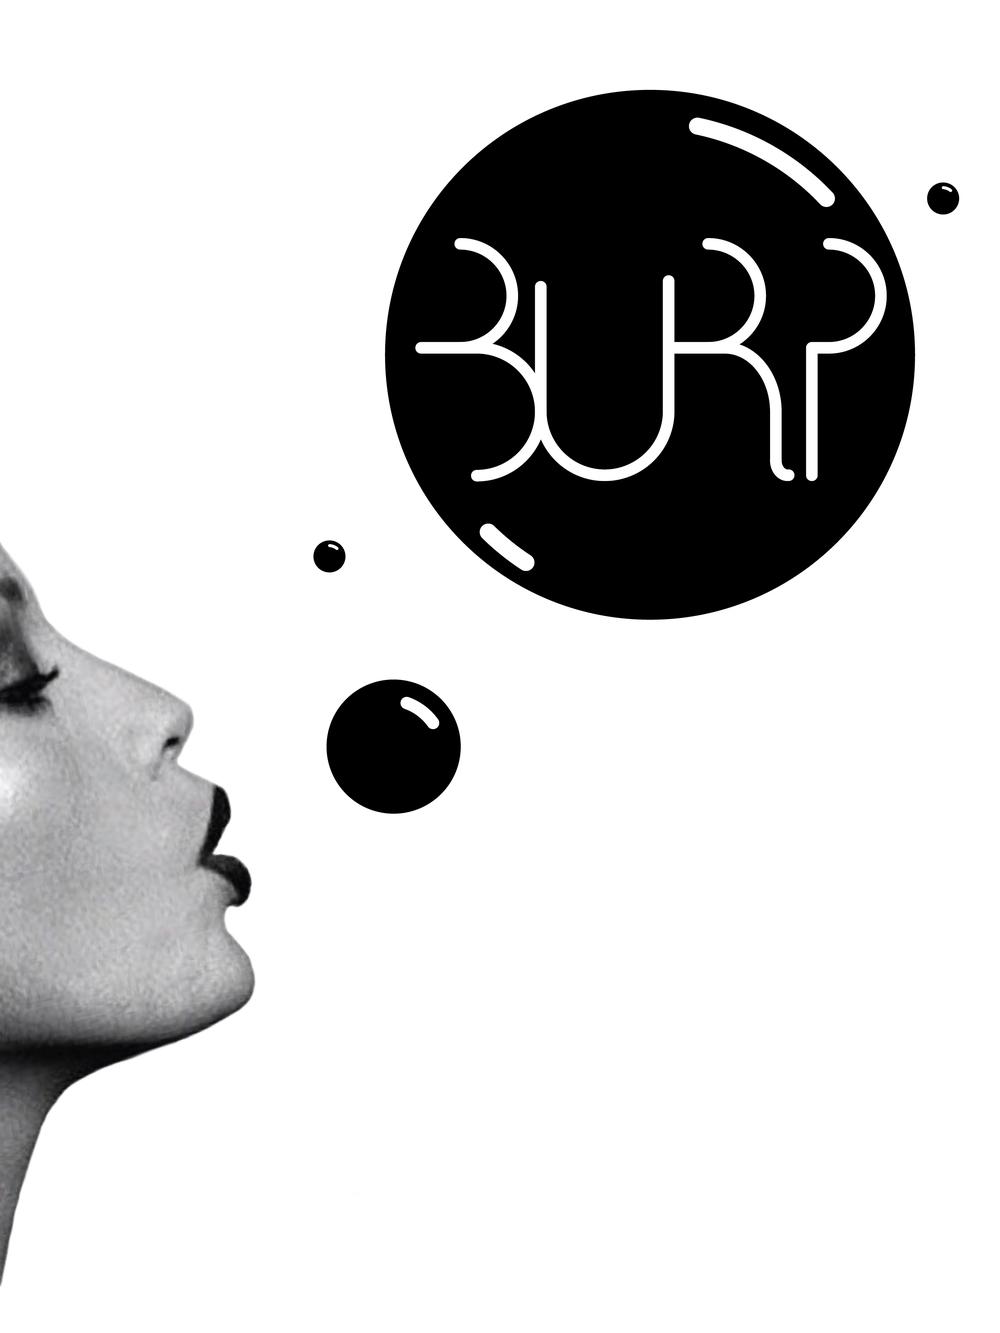 burpbubble-01.jpg